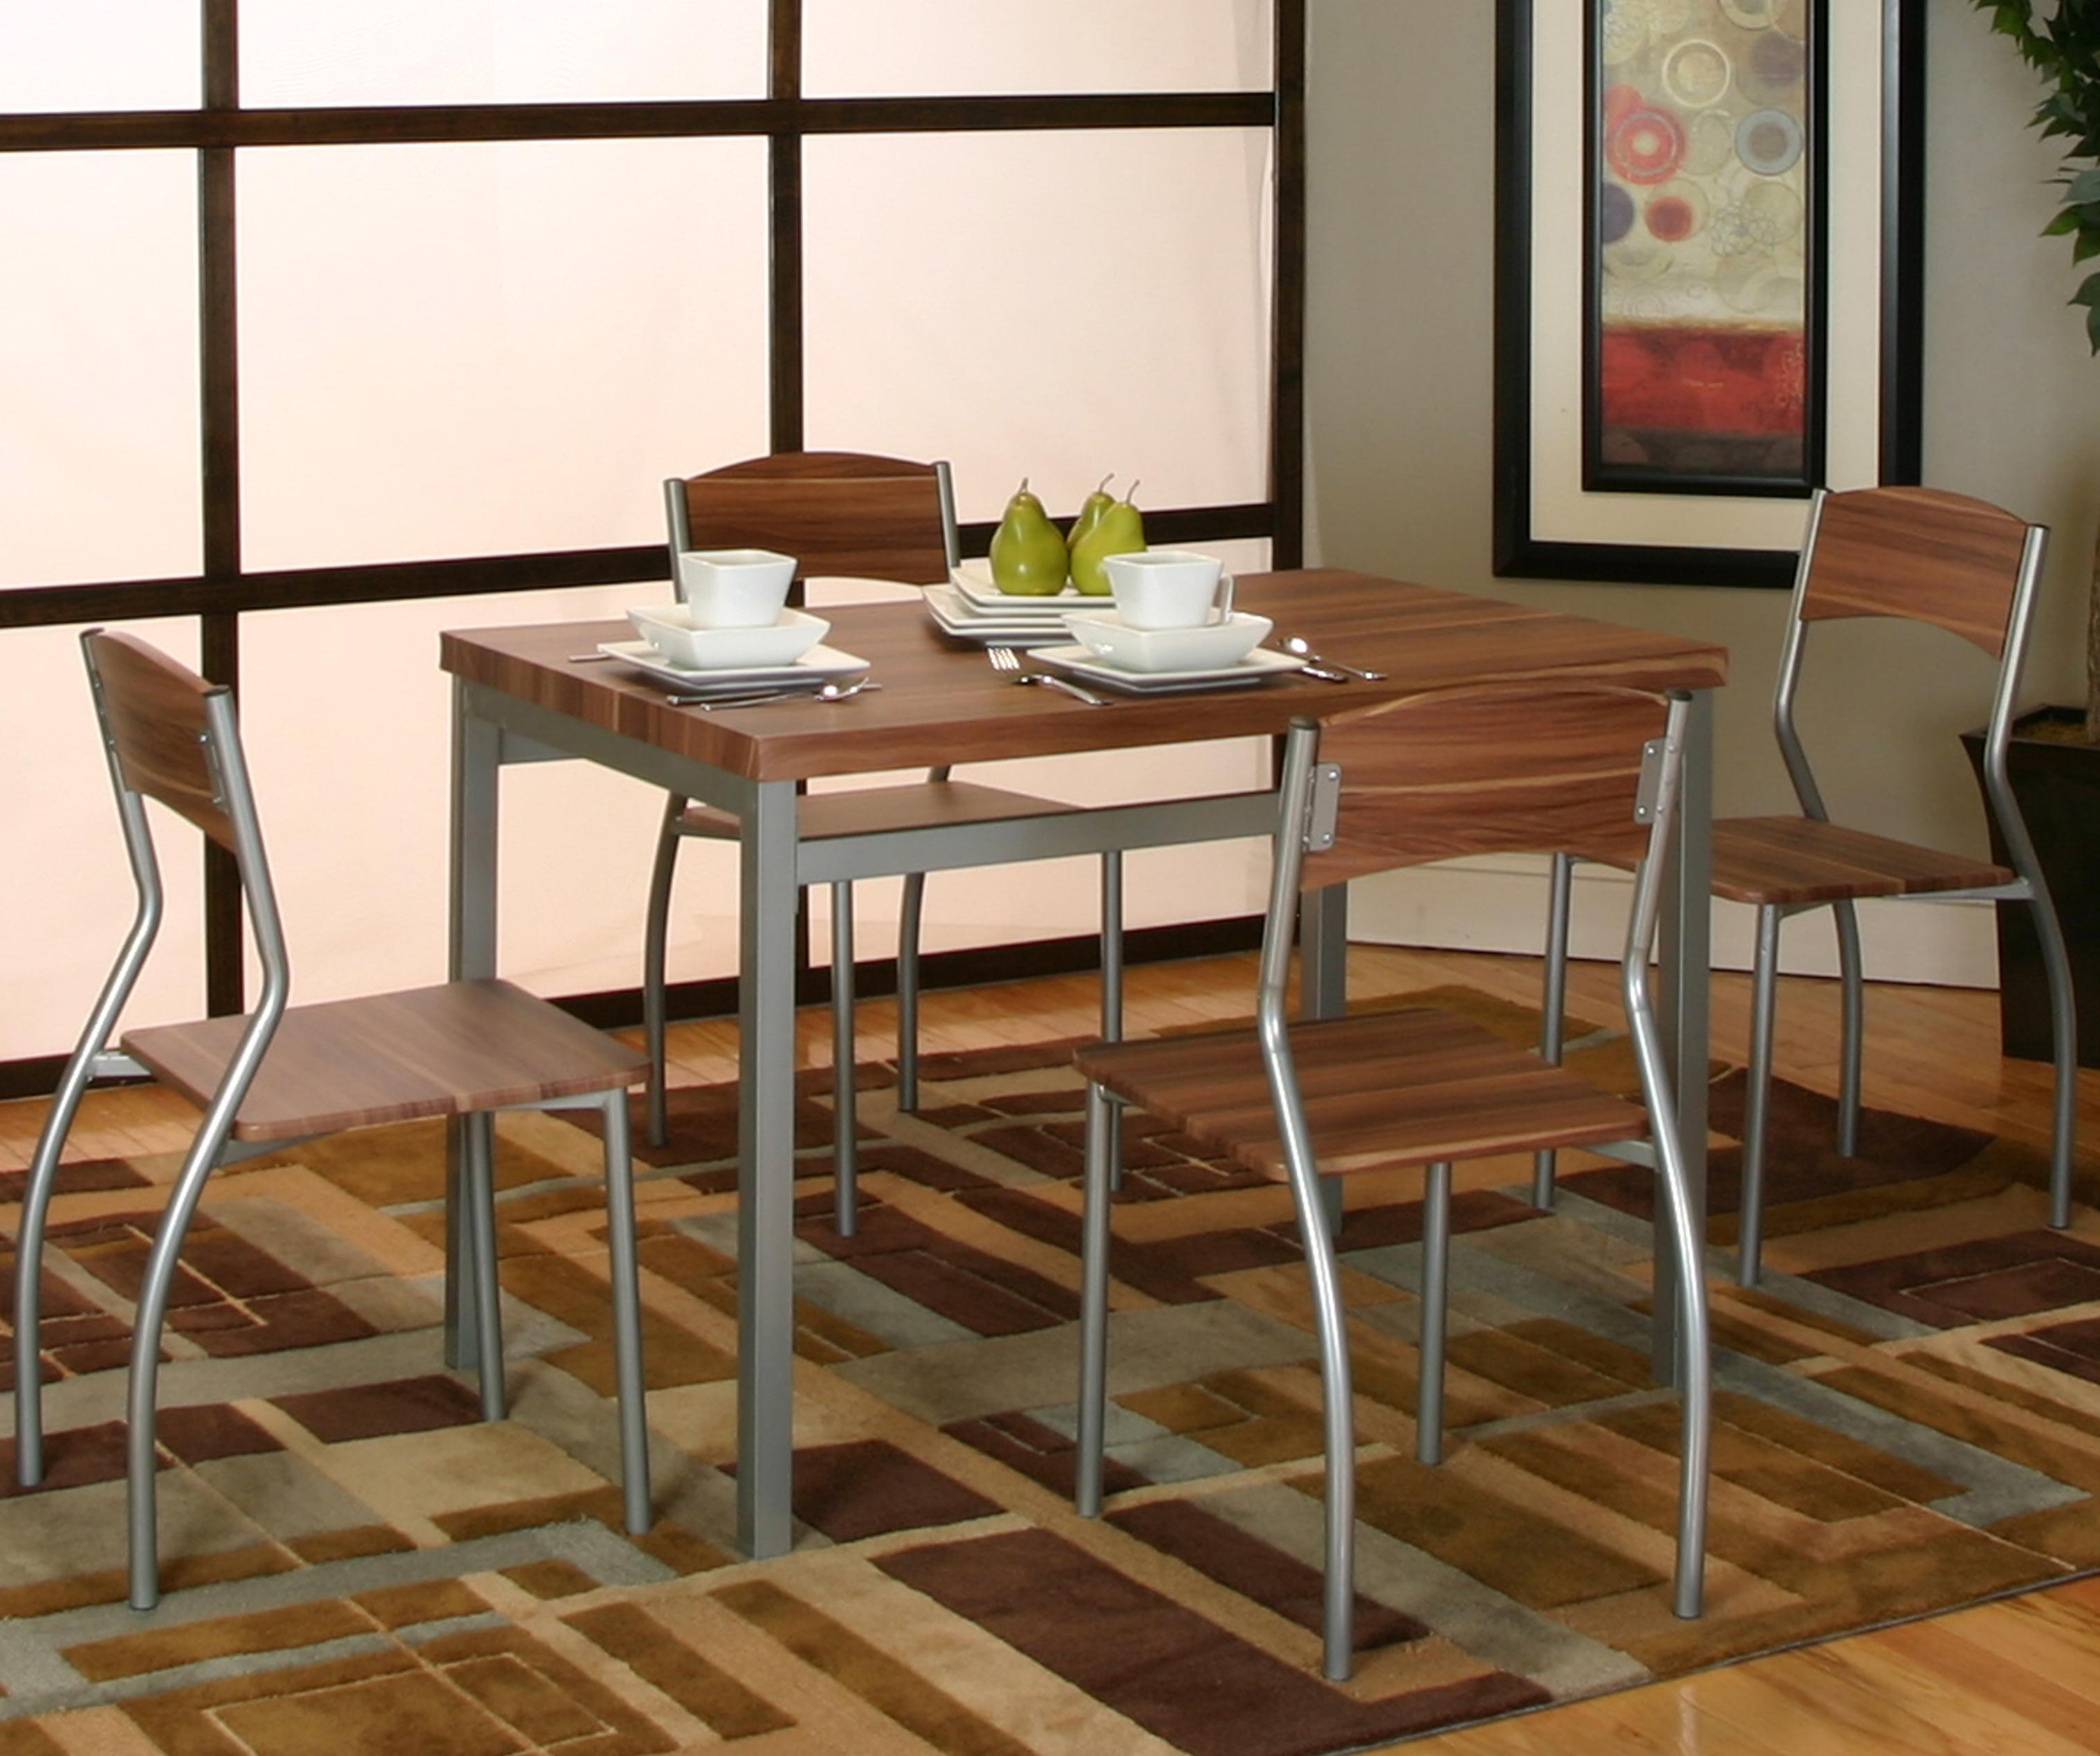 Cramco, Inc Lark 5 Piece Dining Set - Item Number: E2329-56+4x01